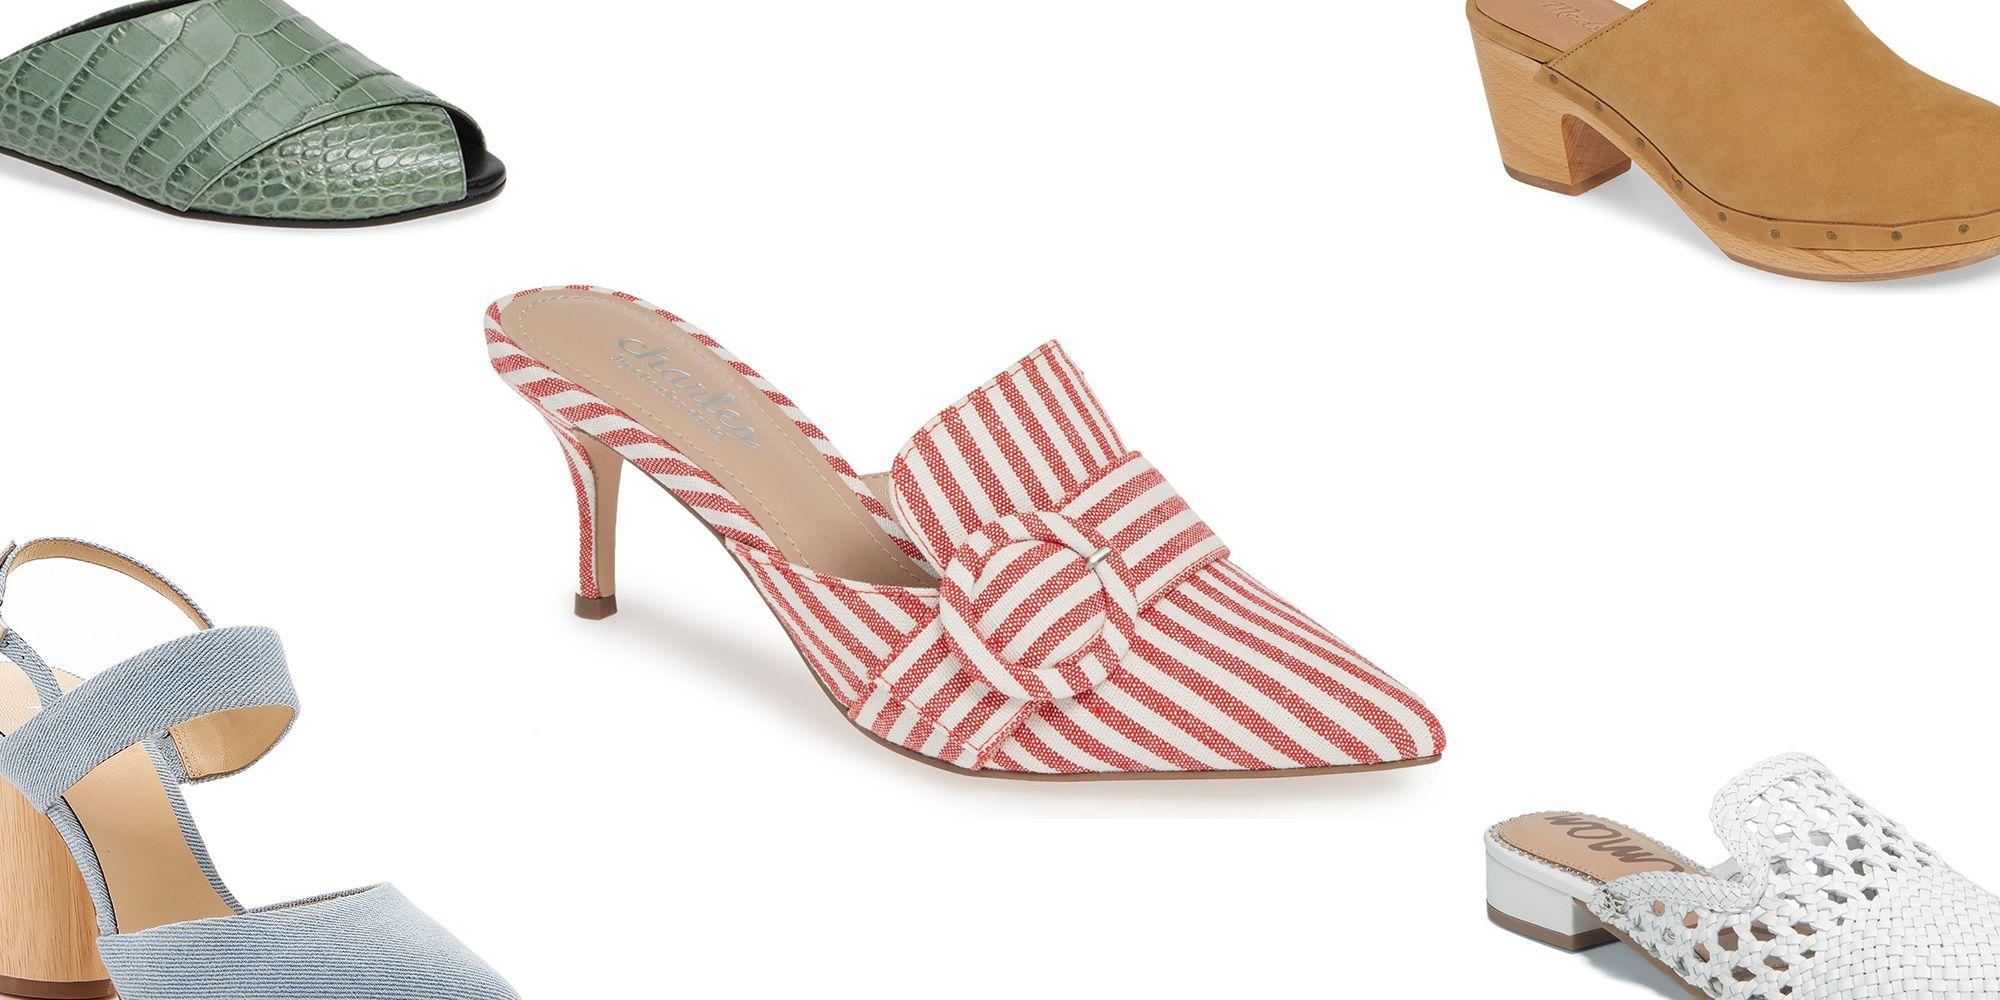 Trendy Summer Sandals 2020 - 65 Cute